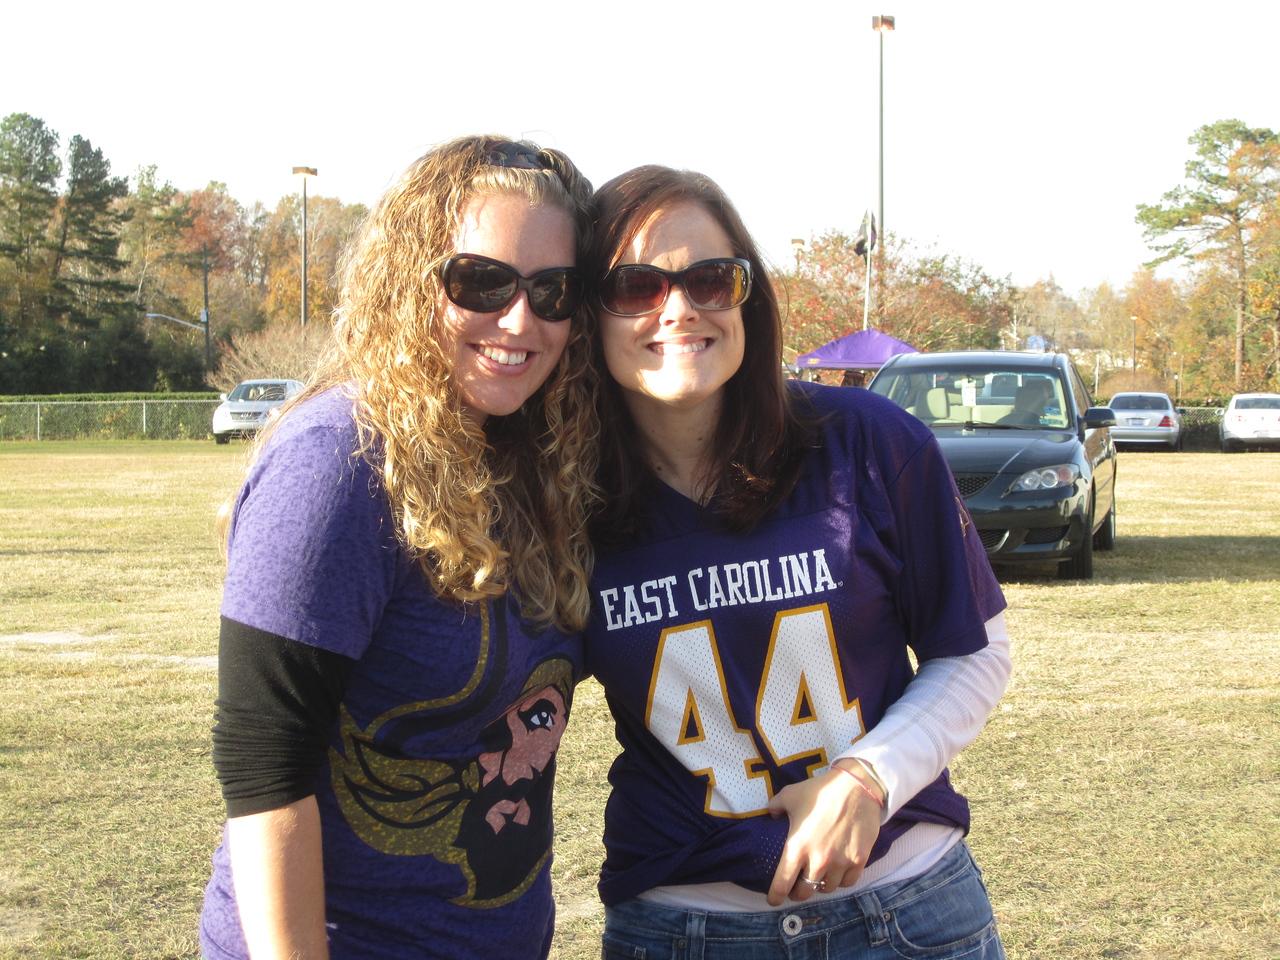 11/19/2011 ECU vs University of Central Florida - Lauren, Missy